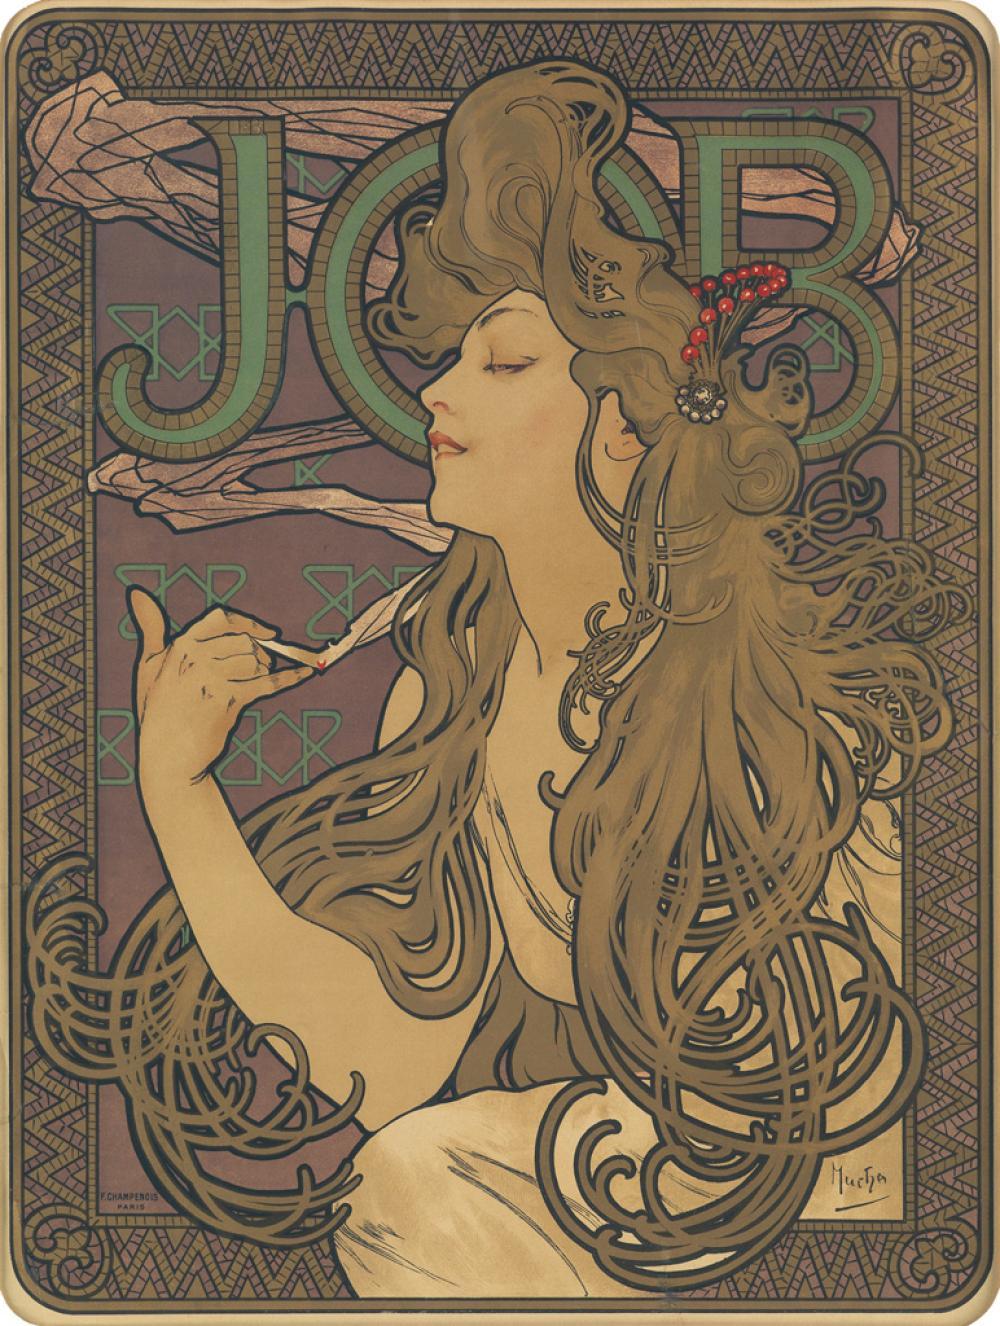 ALPHONSE MUCHA (1860-1939). JOB. 1896. 21x16 inches, 53x42 cm. F. Champenois, Paris.